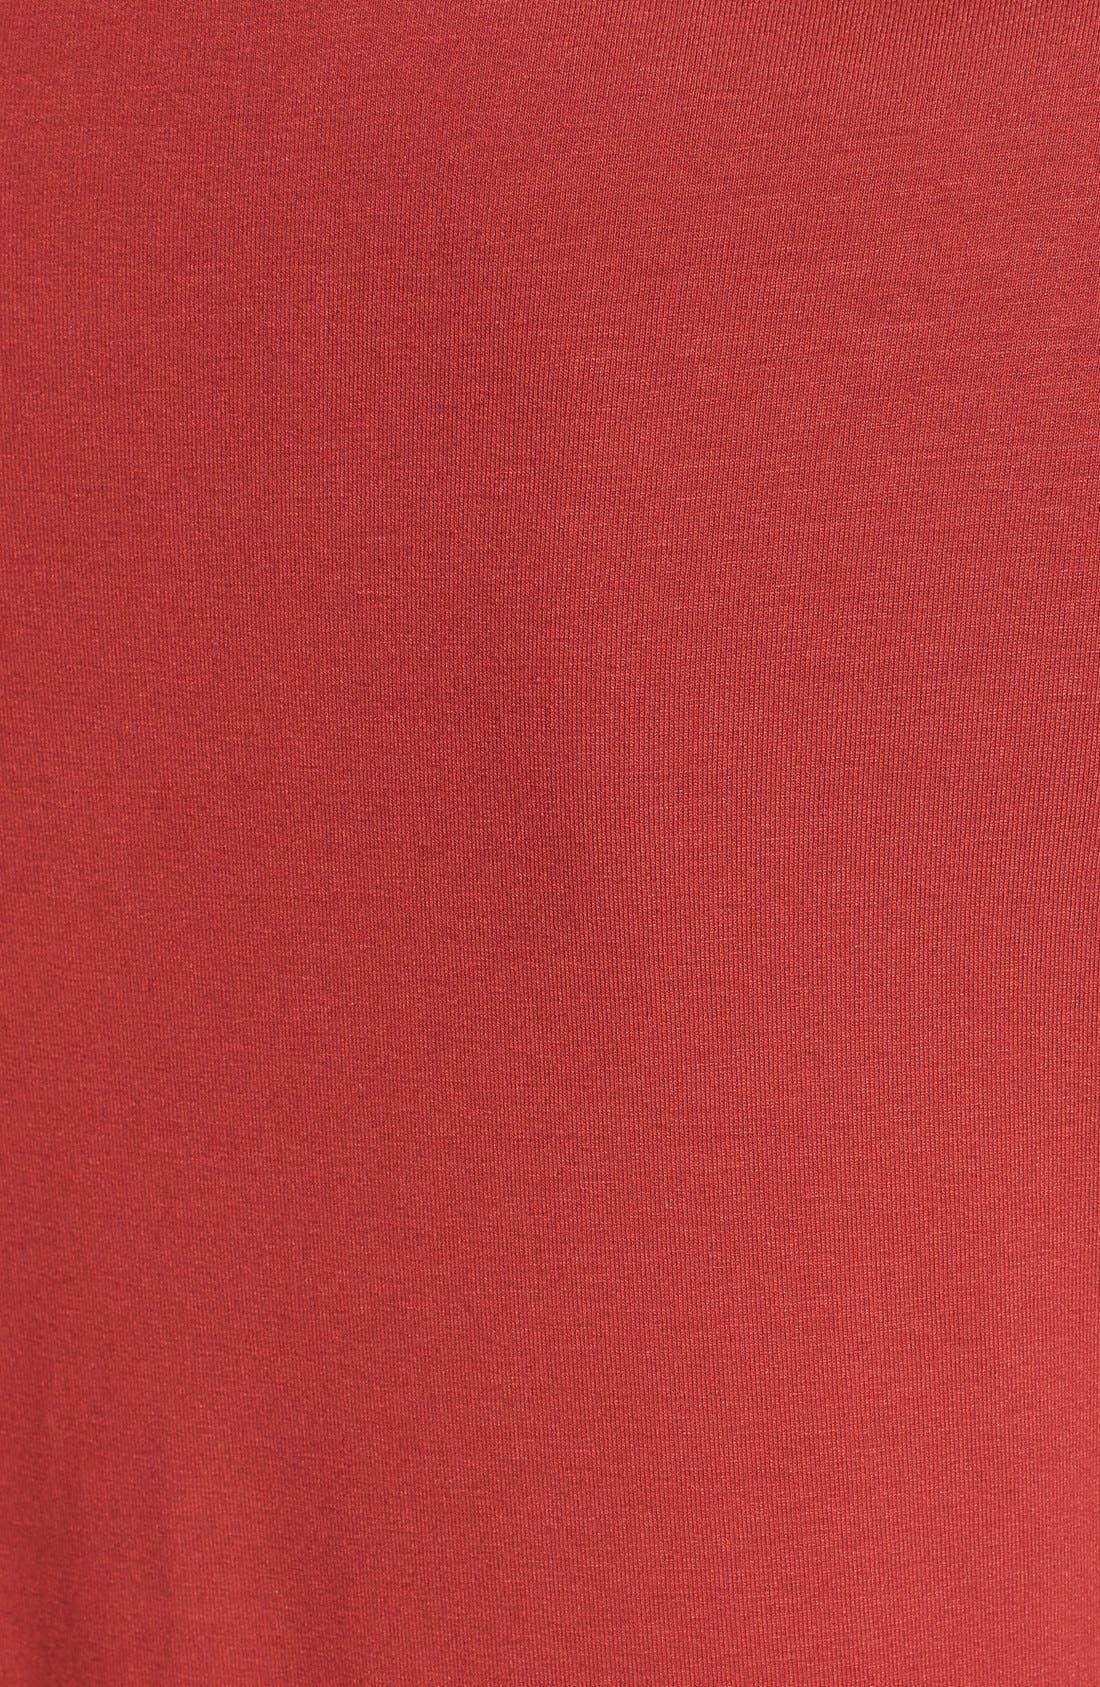 Alternate Image 3  - Eileen Fisher Bateau Neck Jersey Dress